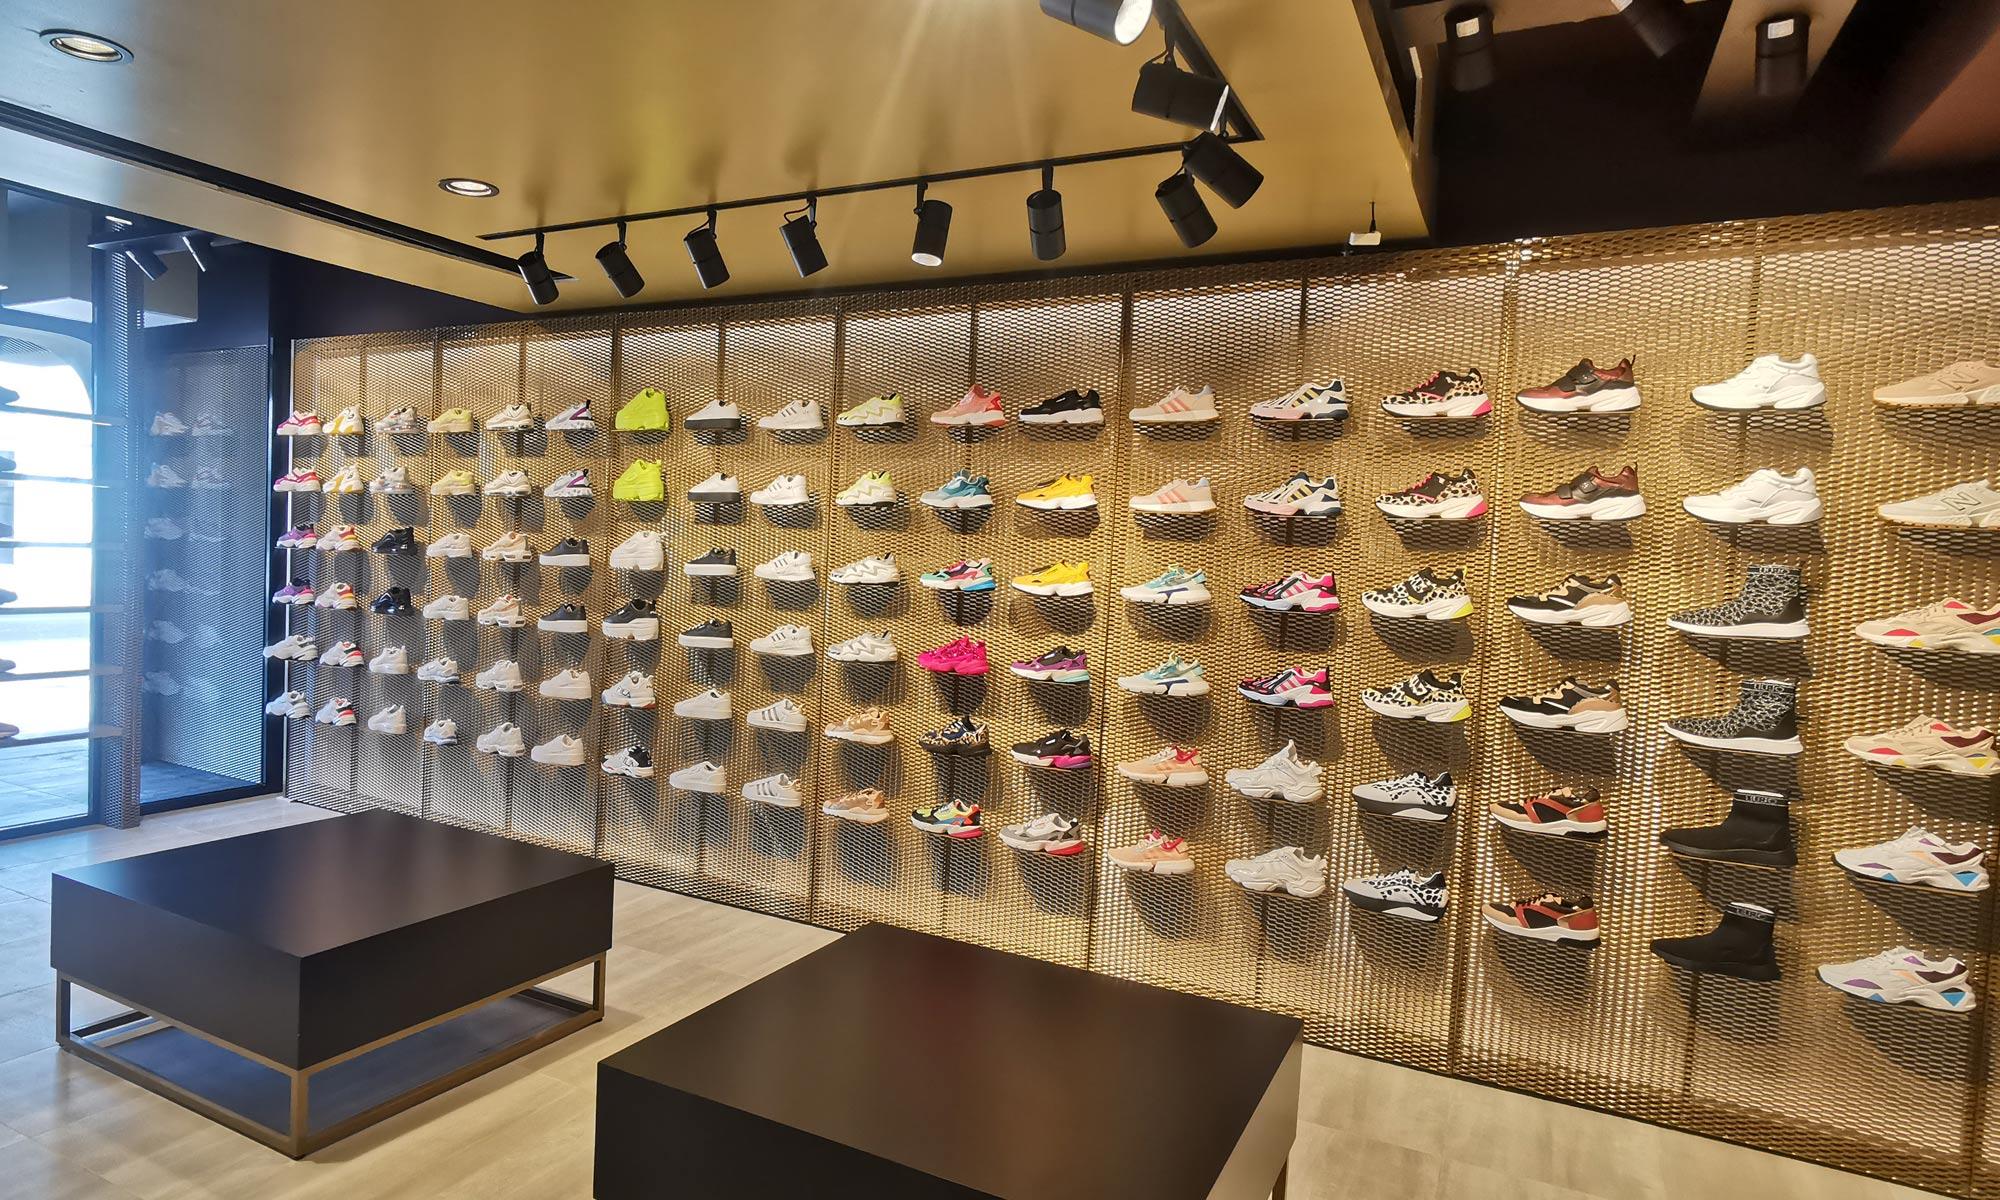 https://www.atelierzoz.com/wp-content/uploads/2020/03/works_atelierzoz_sneakershero-paralimni-1.jpg